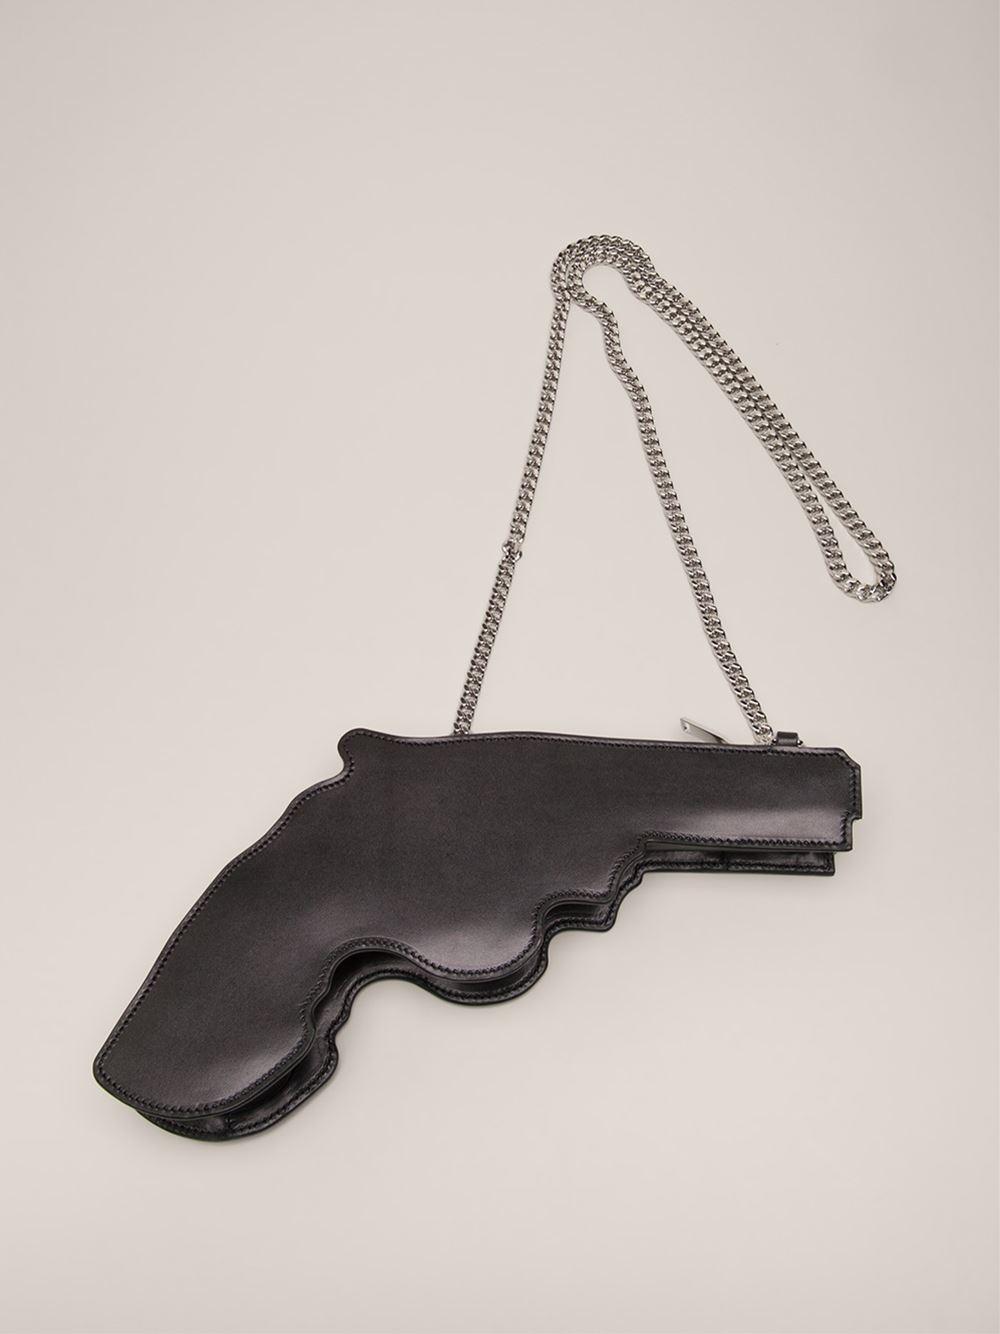 Saint laurent 'bo gun' purse